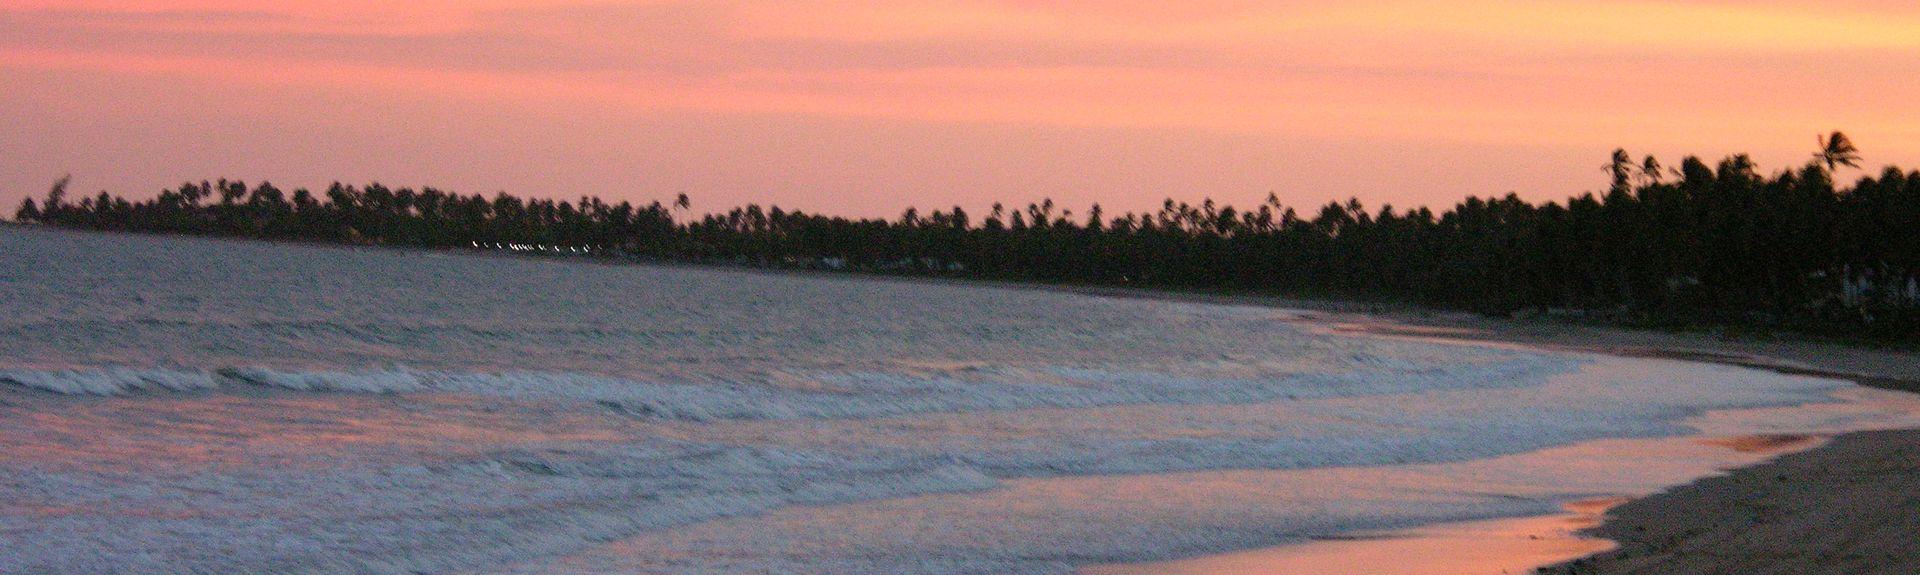 Coroa Grande-stranden, Sao Jose da Coroa Grande, Nordøst-regionen, Brasil